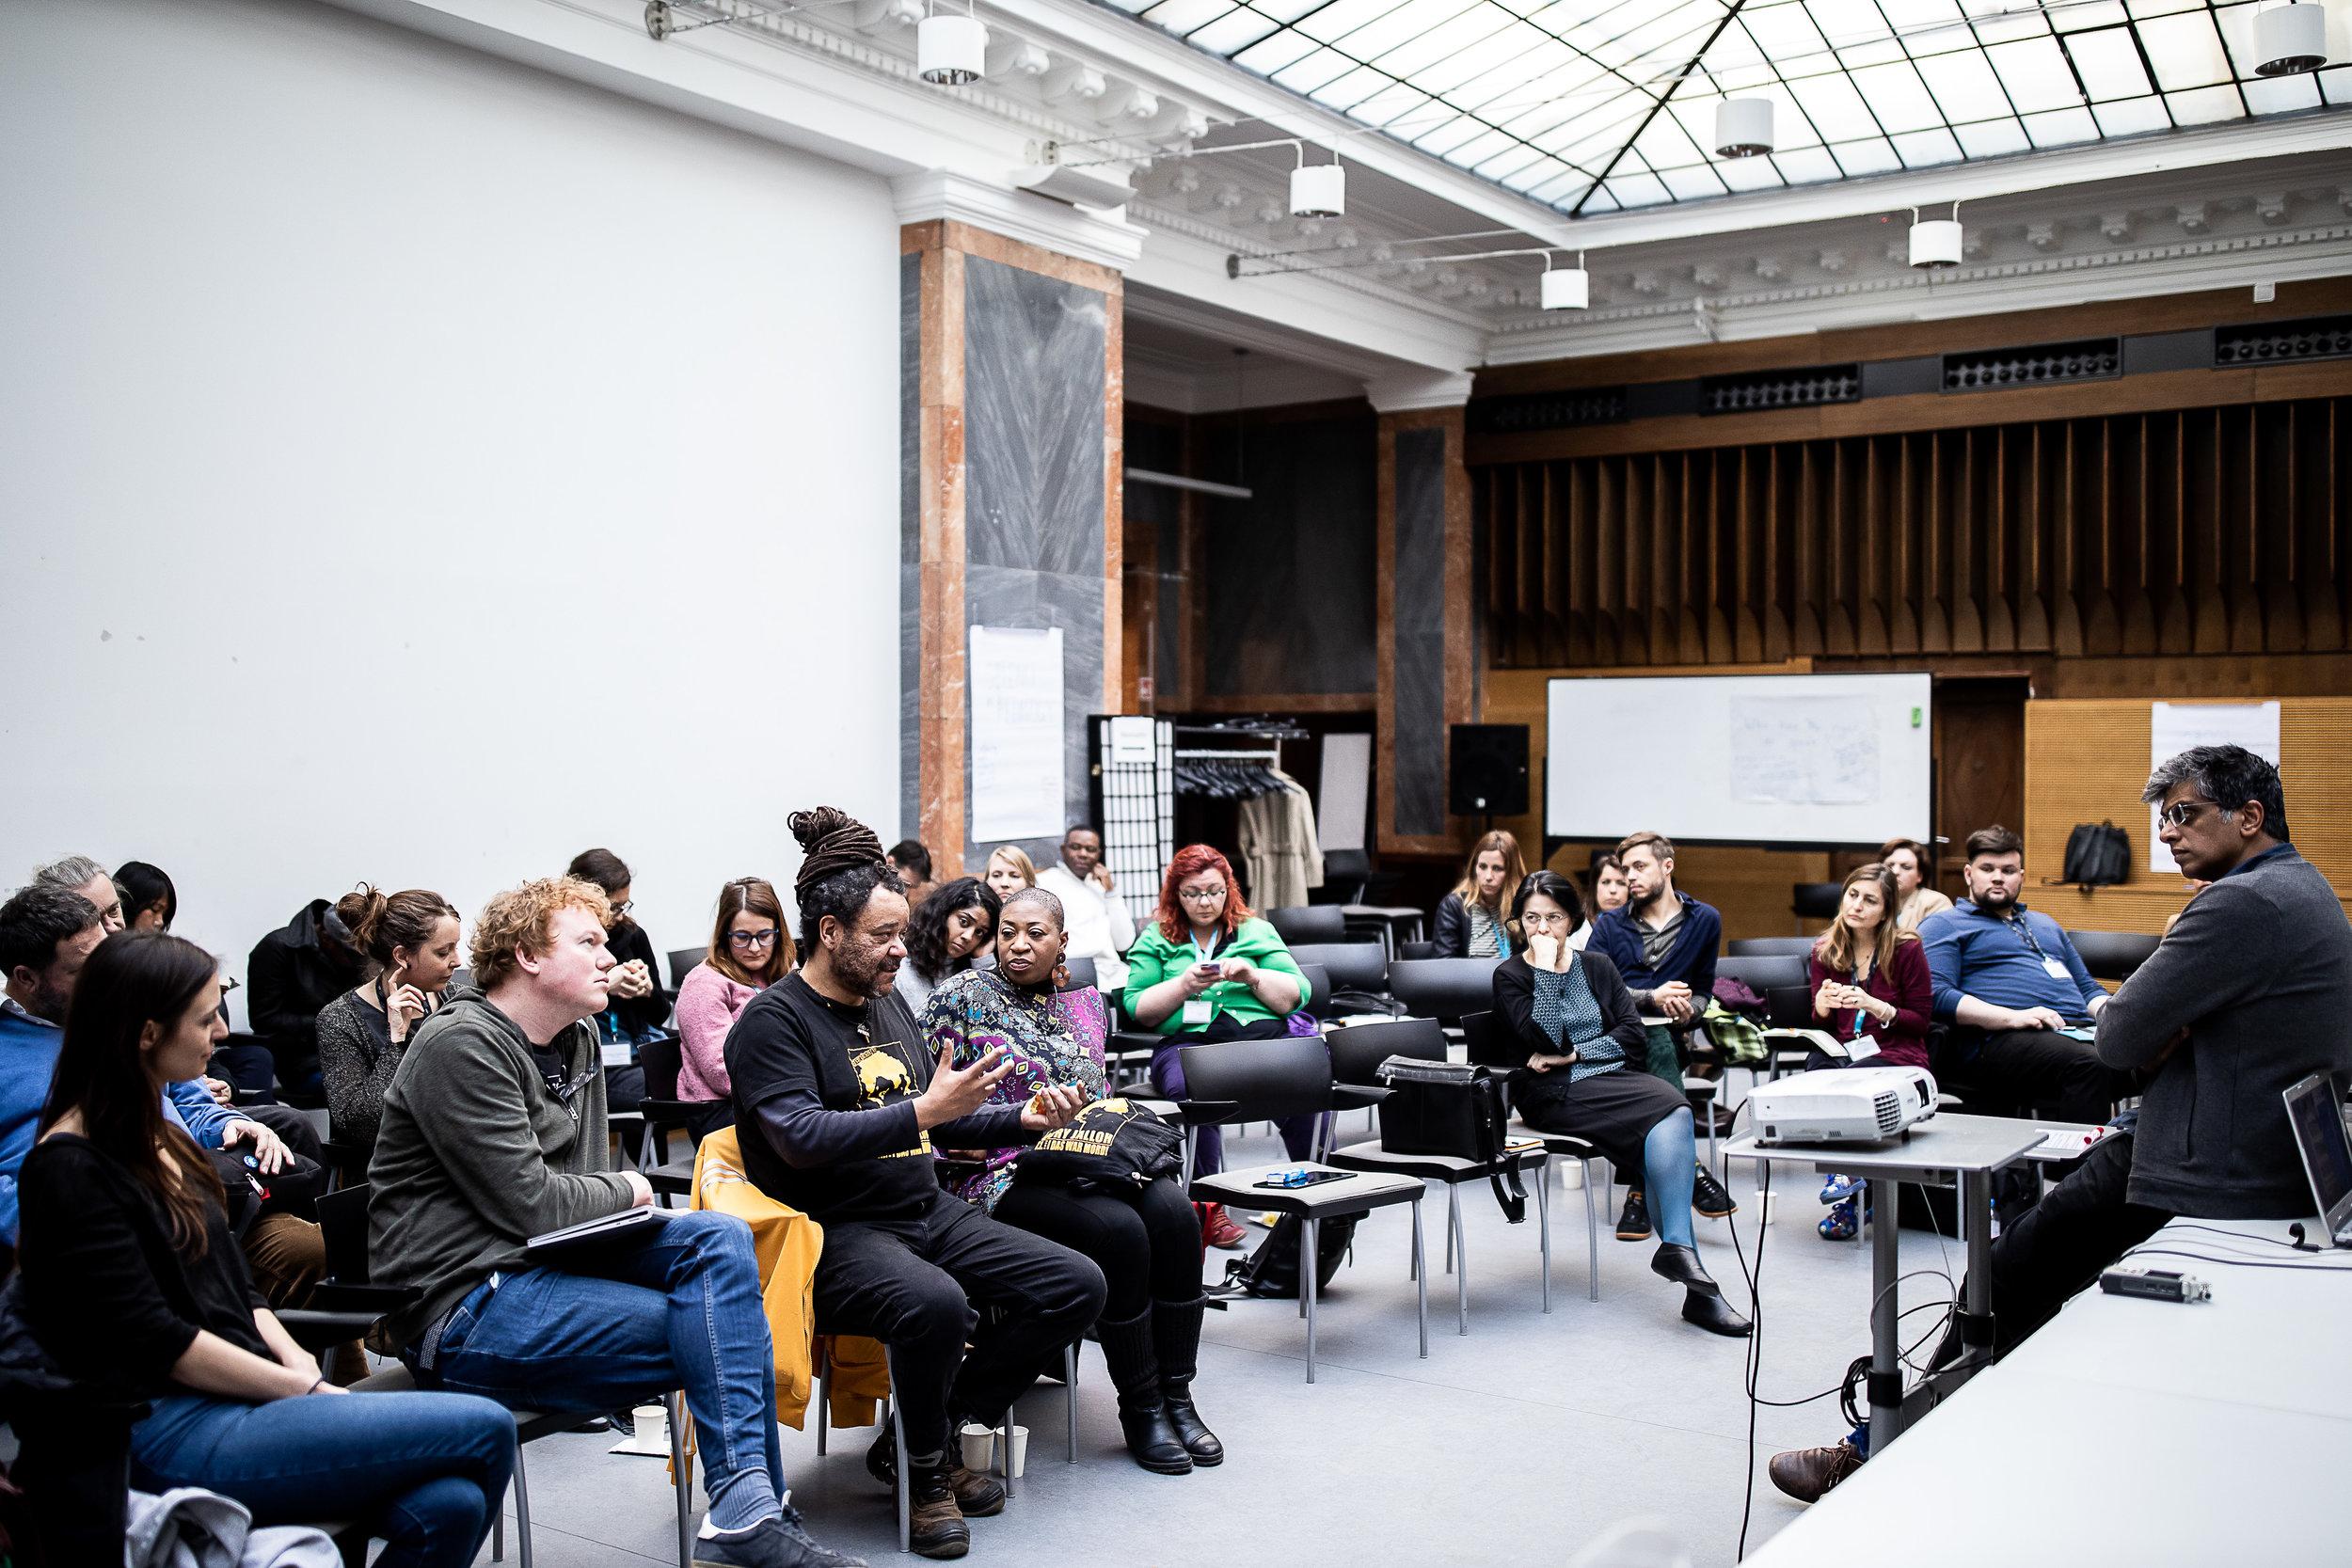 Consortium conference in Budapest, March 2019. Image credit: CEU / Zoltan Adrian (Kepszerkesztoseg)